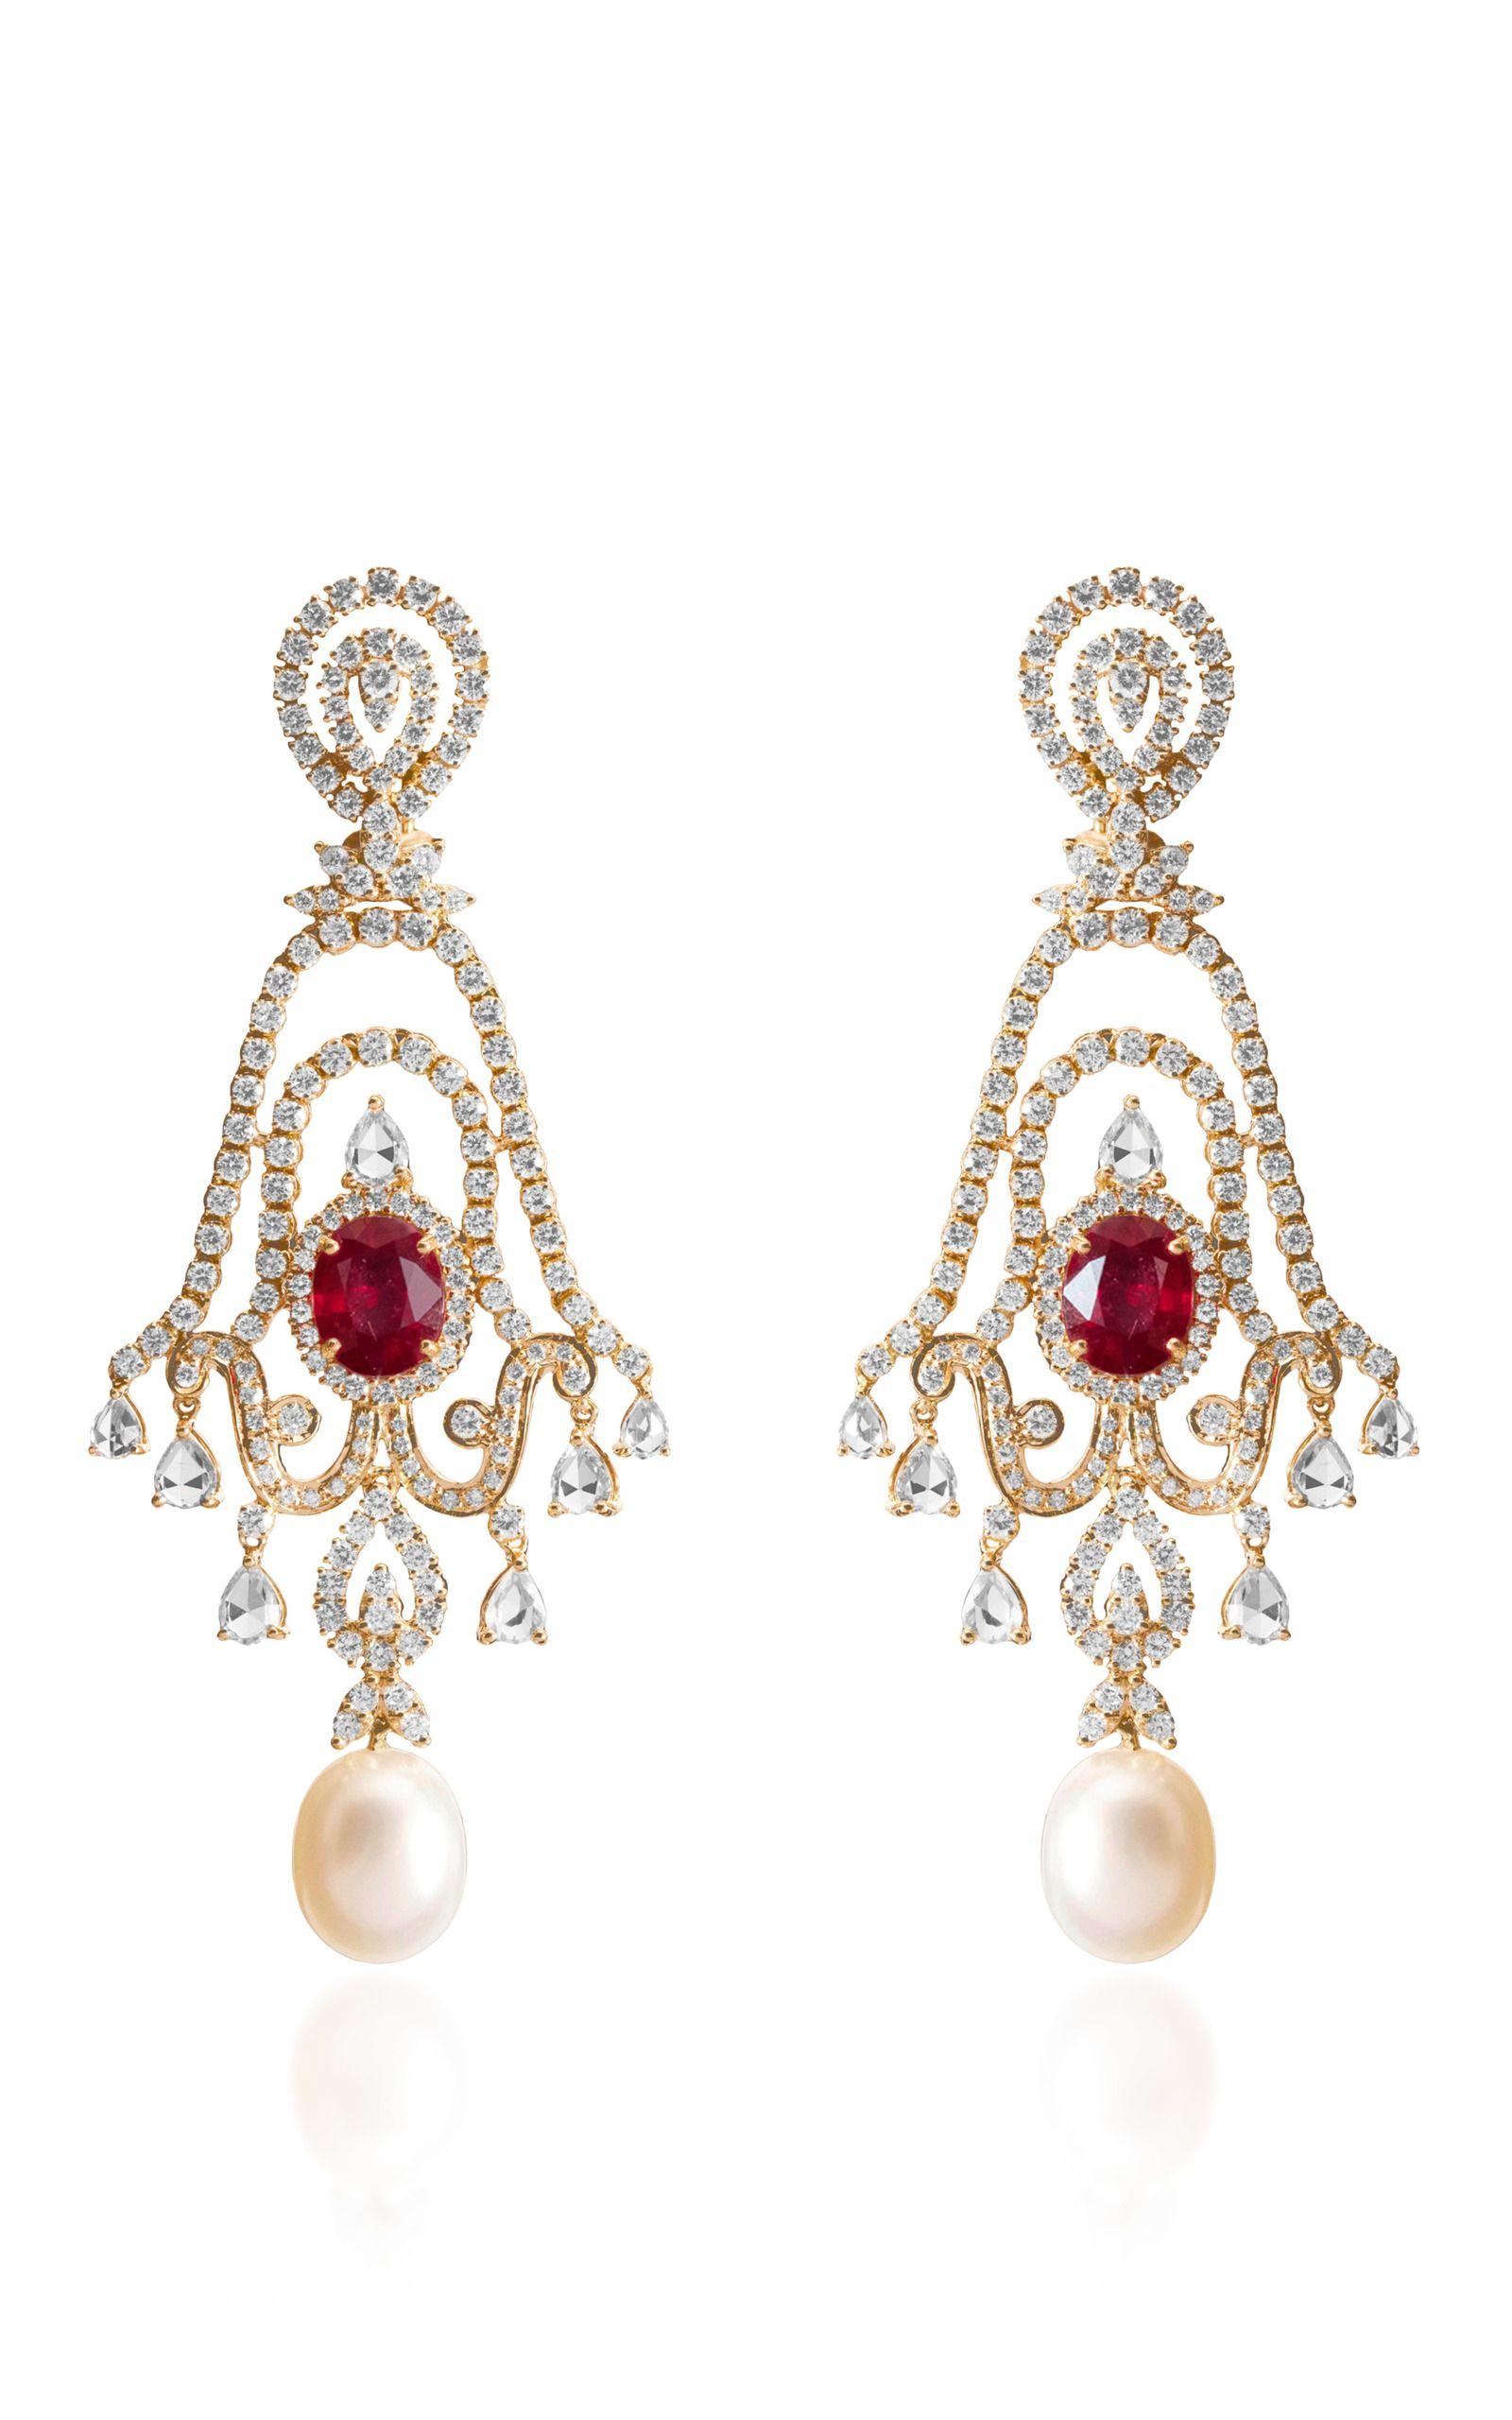 Pearl and Diamond Necklace Farah Khan Ali Beautiful pearls